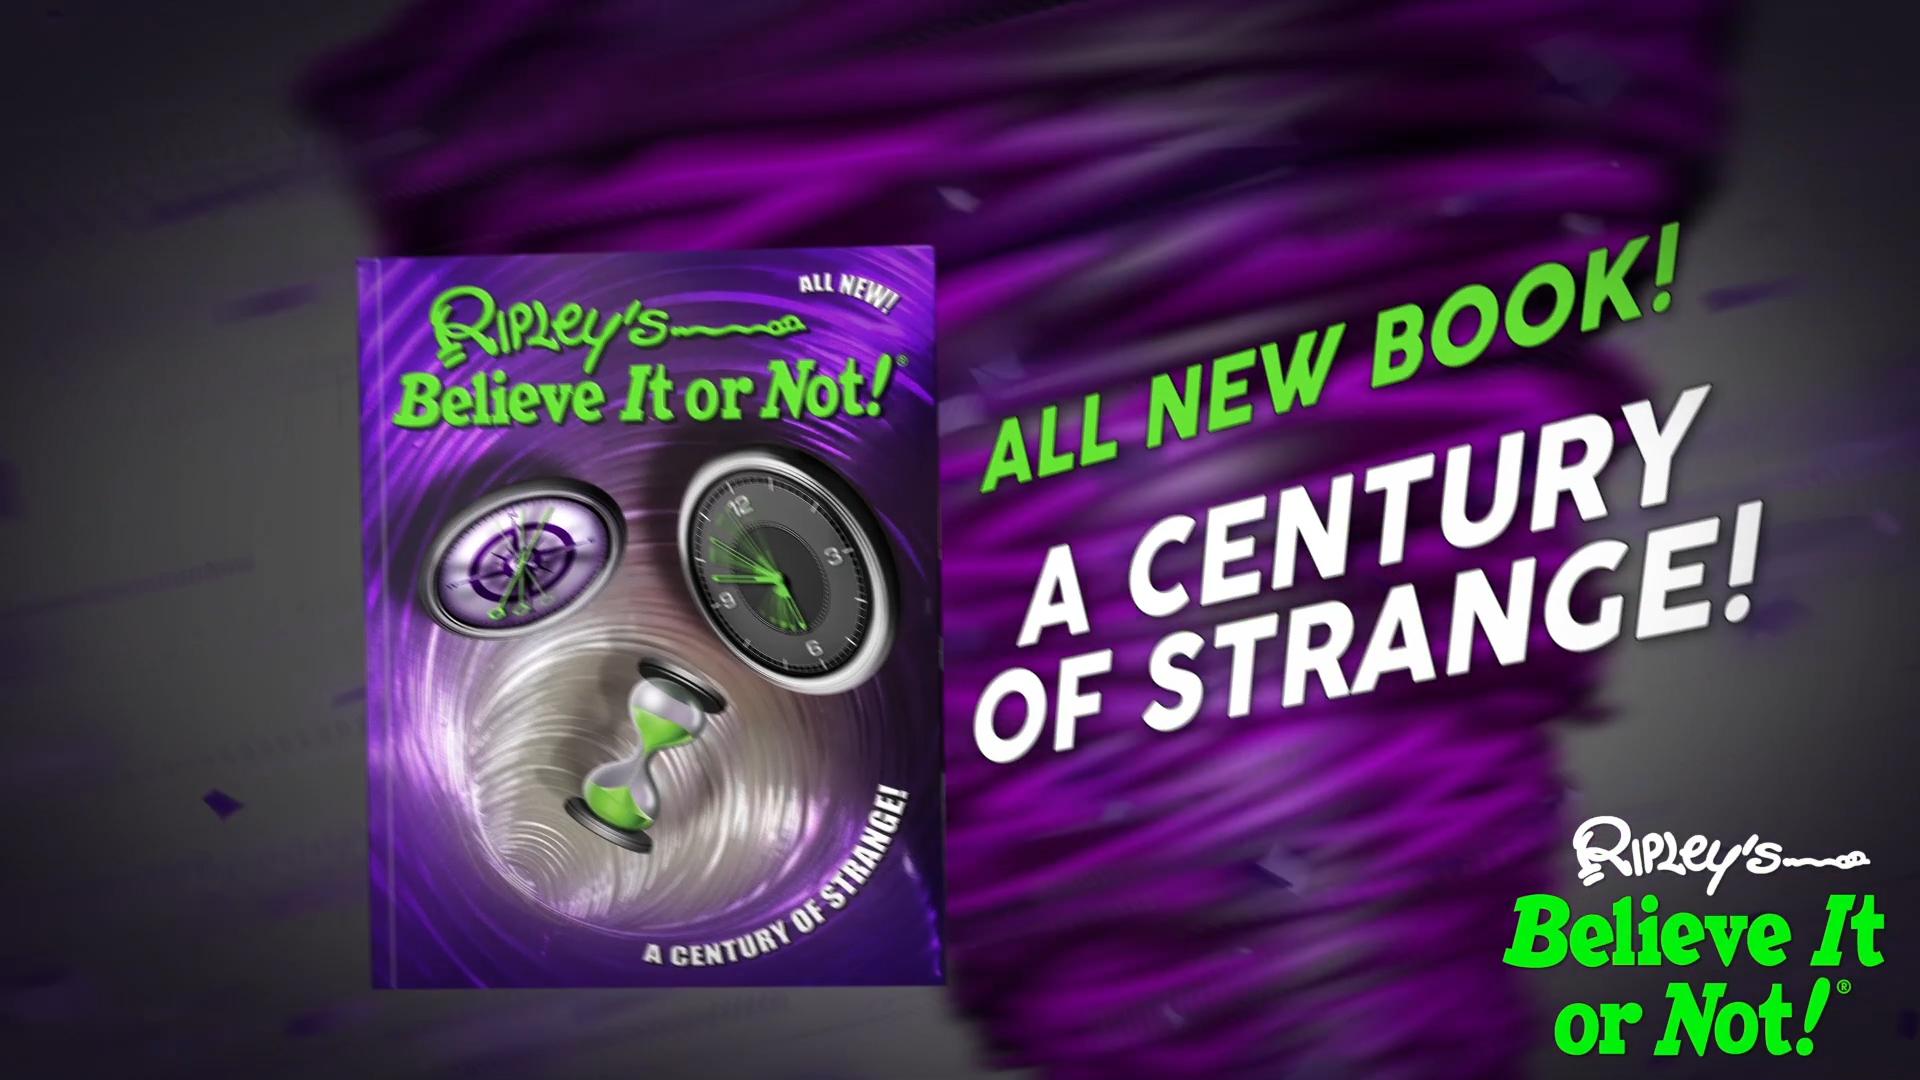 century of strange